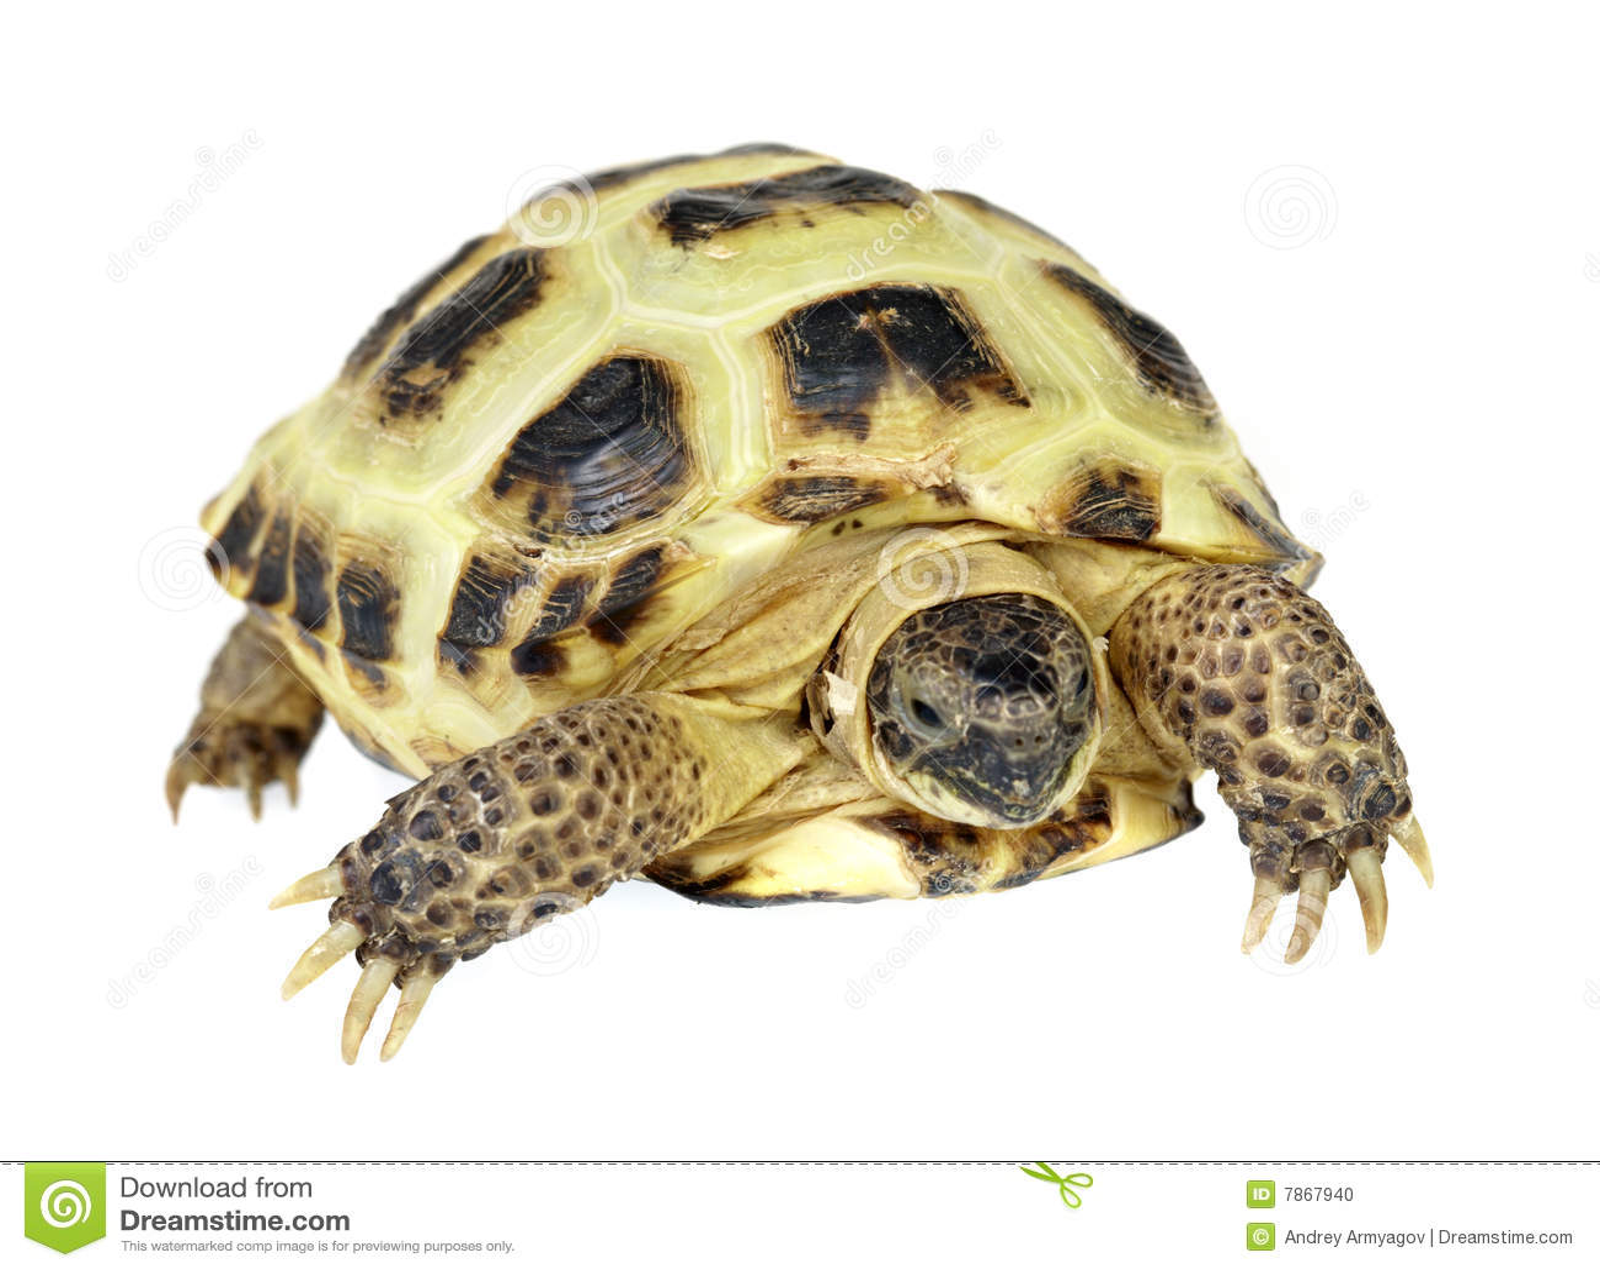 turtle white background - photo #30